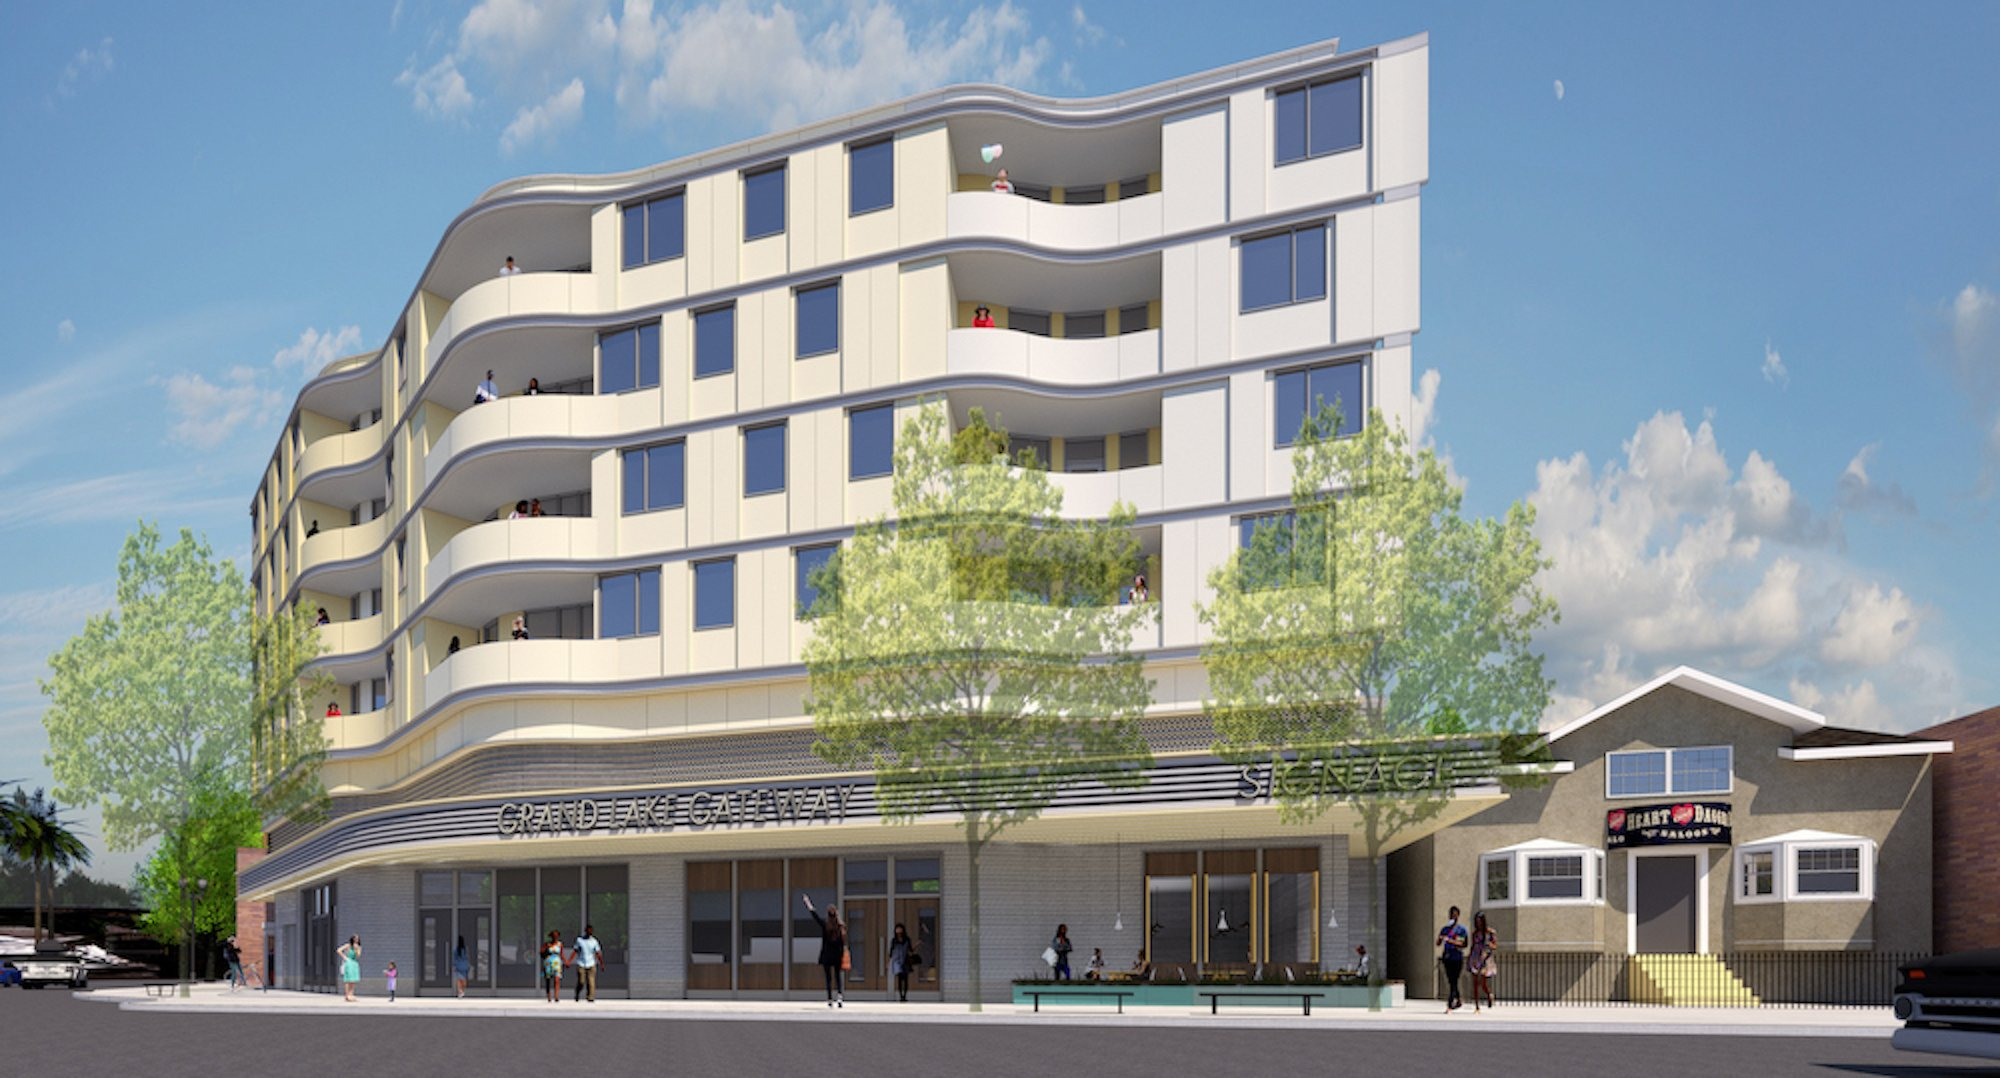 500 Lake Park-Oakland, California-Lowney Architecture-4